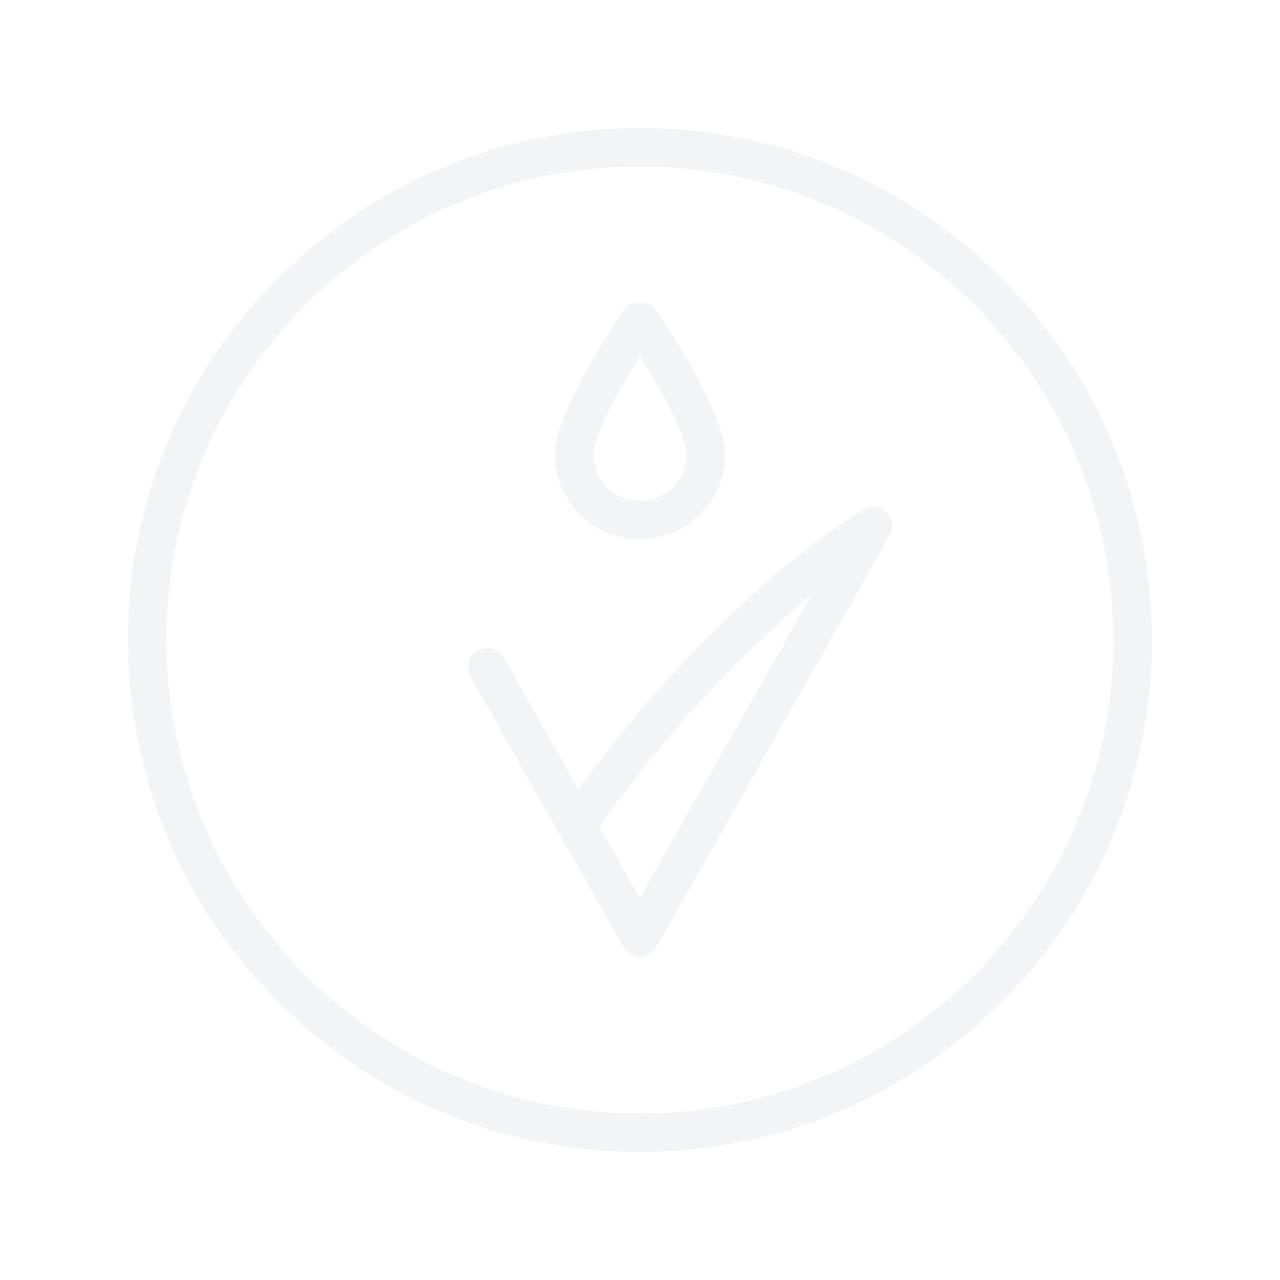 Sleek Makeup Twist Up Lip Pencil No.996 Sugared Apple 0.3g